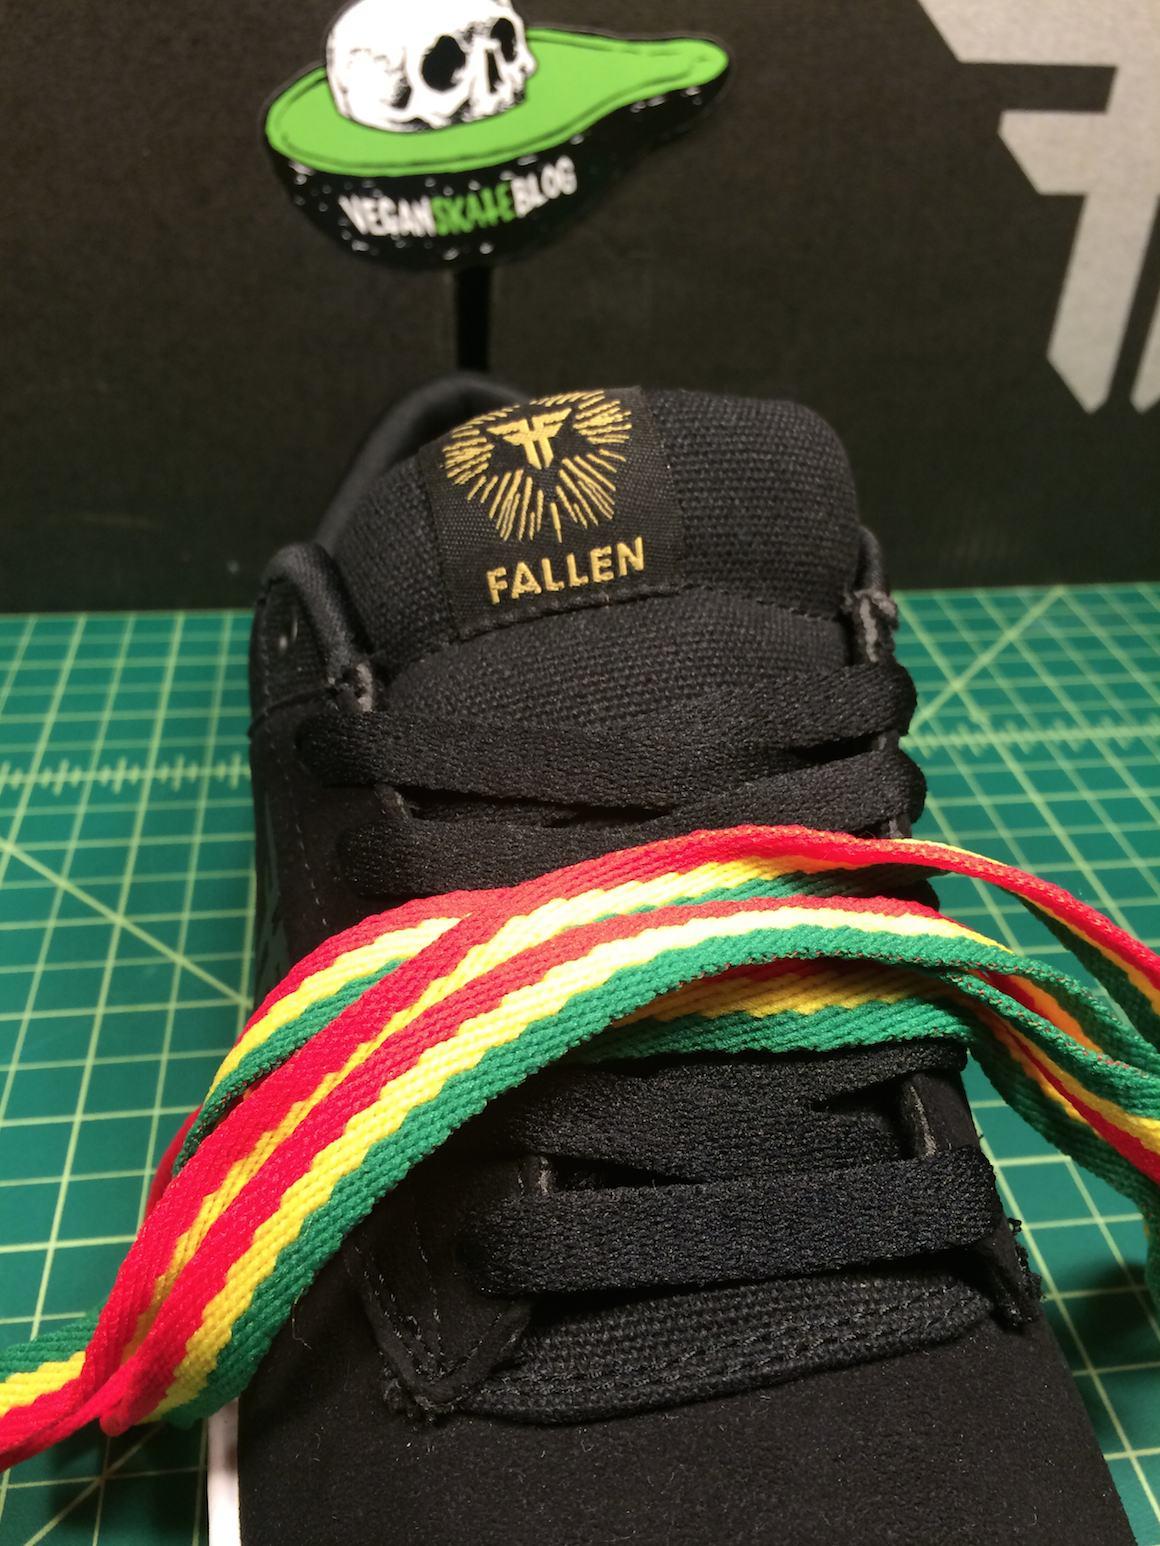 vegan skateboard shoes rasta laces fallen synthetic